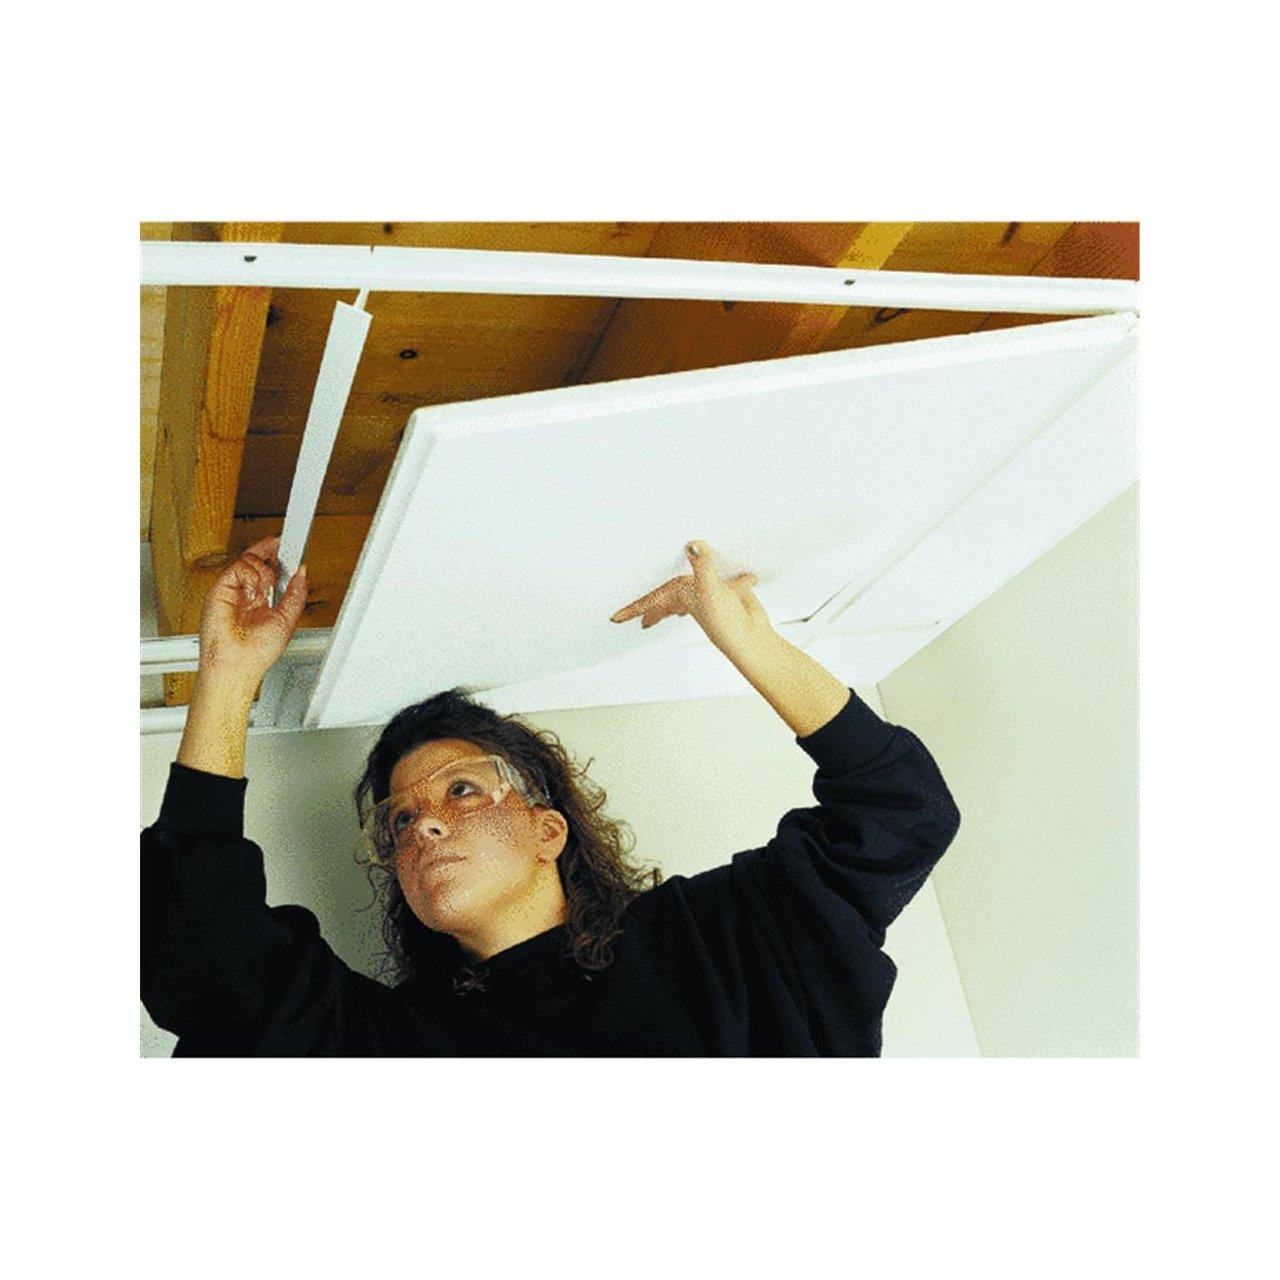 Amazon acp acoustic ceiling prod 100 003 ceilingmax 8 top amazon acp acoustic ceiling prod 100 003 ceilingmax 8 top hanger decorative tiles garden outdoor dailygadgetfo Choice Image